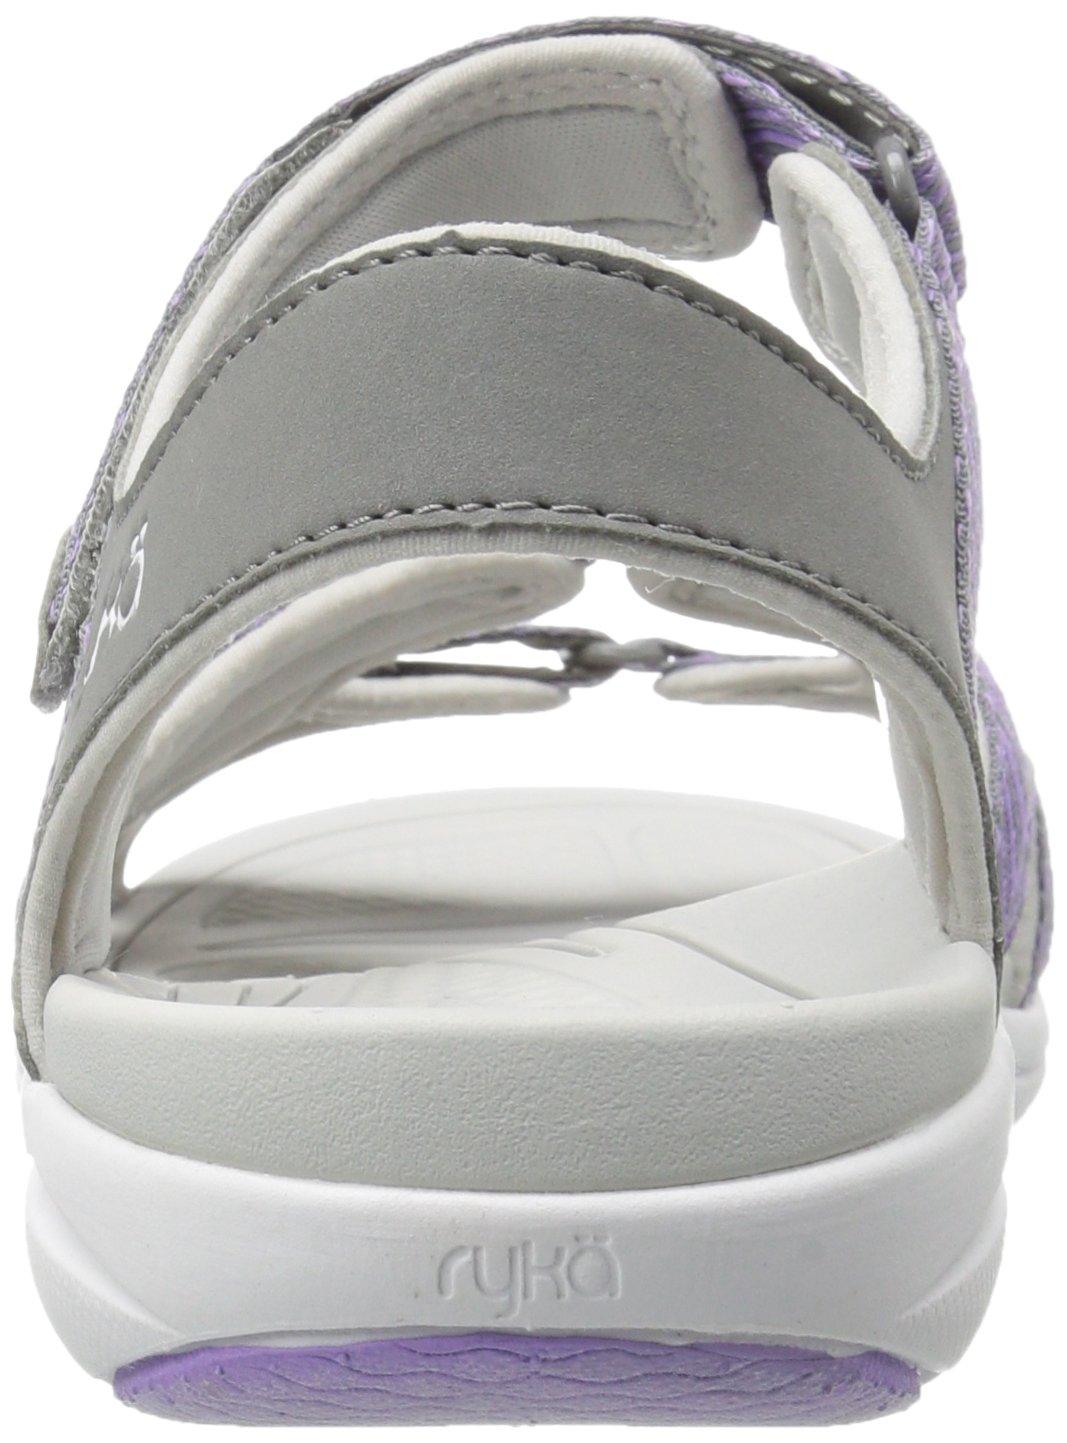 Ryka Women's Savannah Sandal B01KWH4DCG 11 B(M) US Grey/Purpl